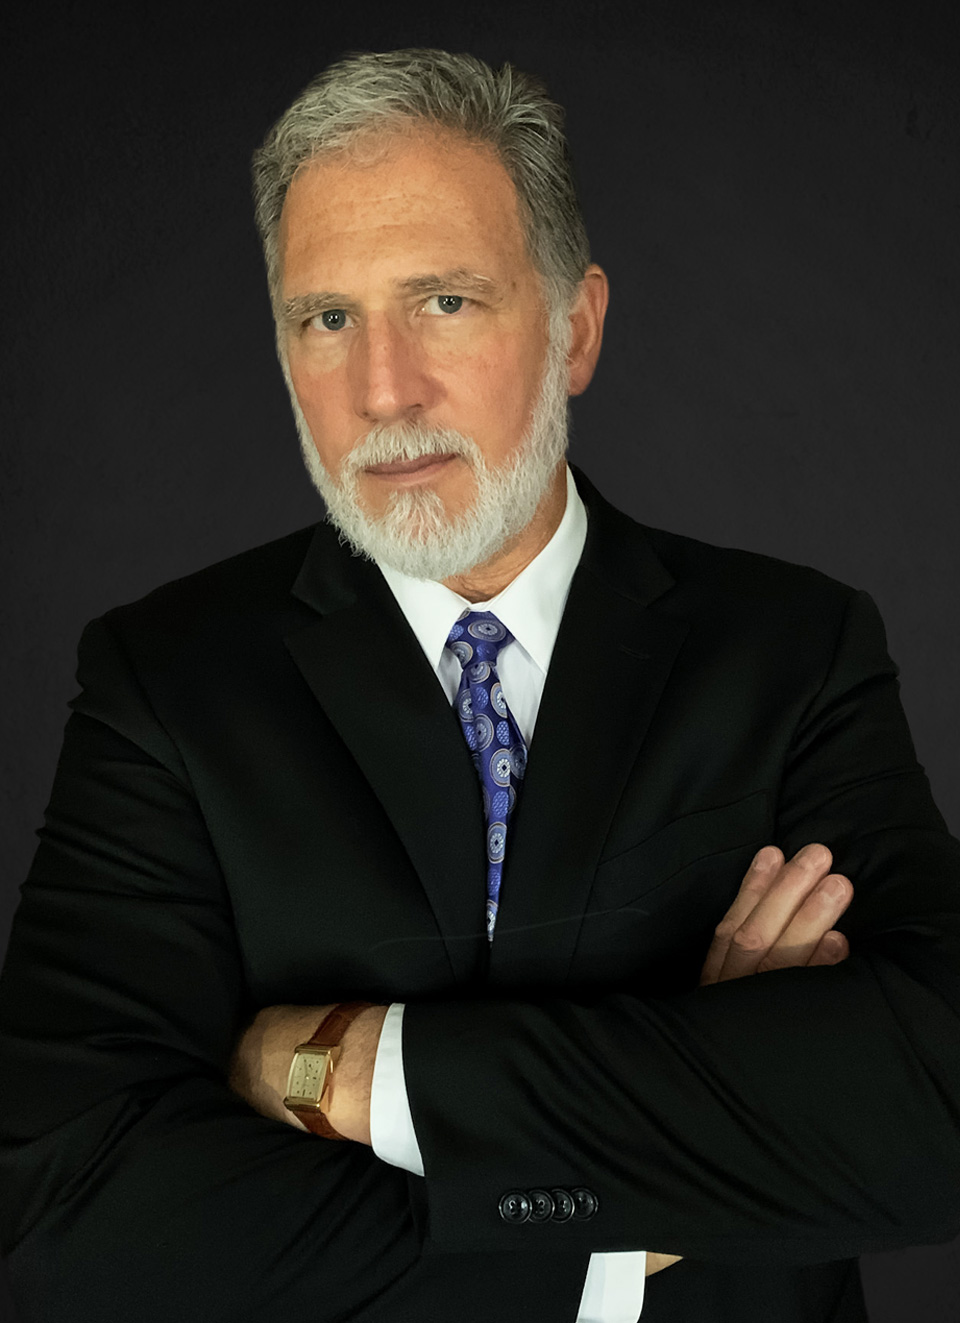 Martin Kofsky